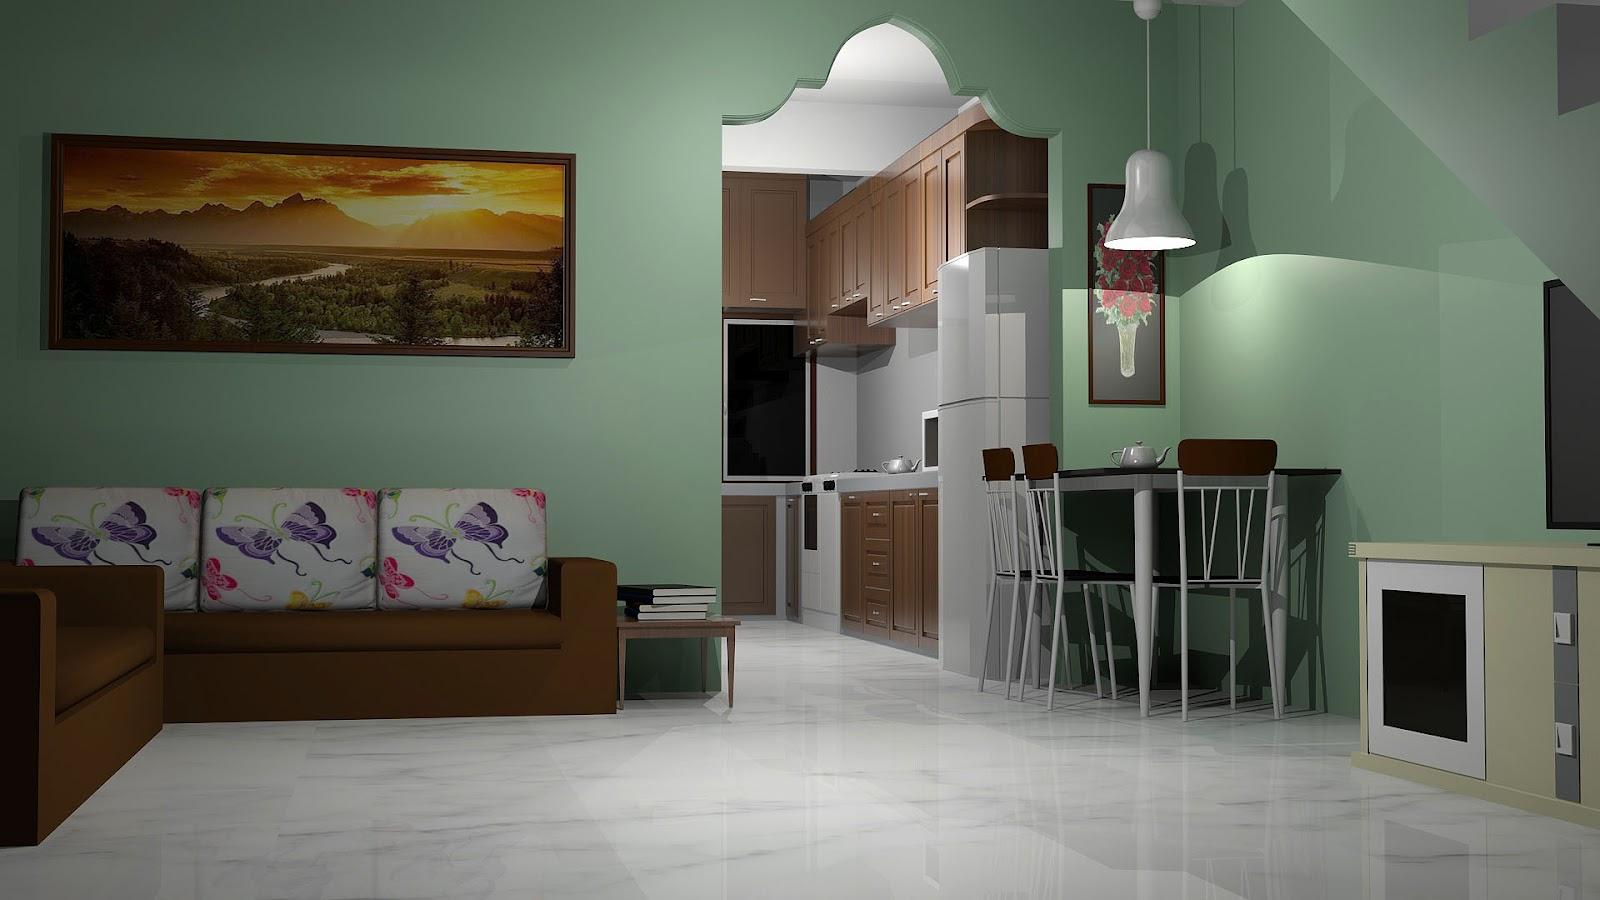 islamic interior exterior design ubahsuai ruang tamu